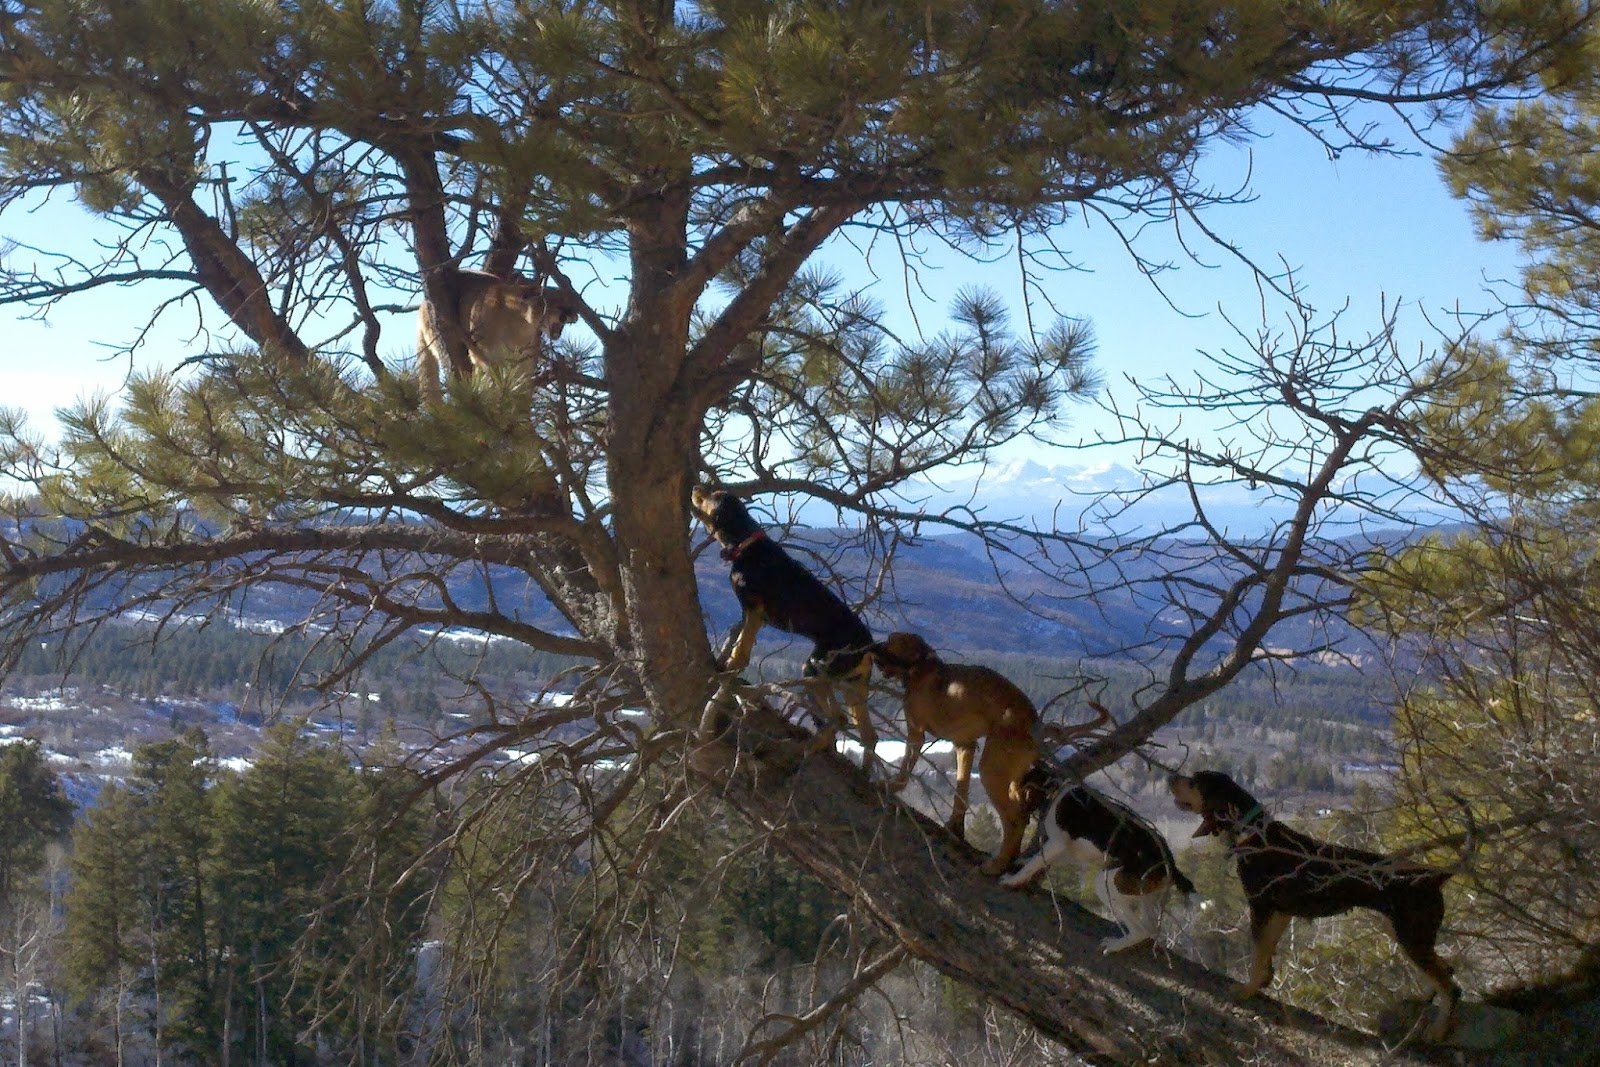 Lion Hunting Dog